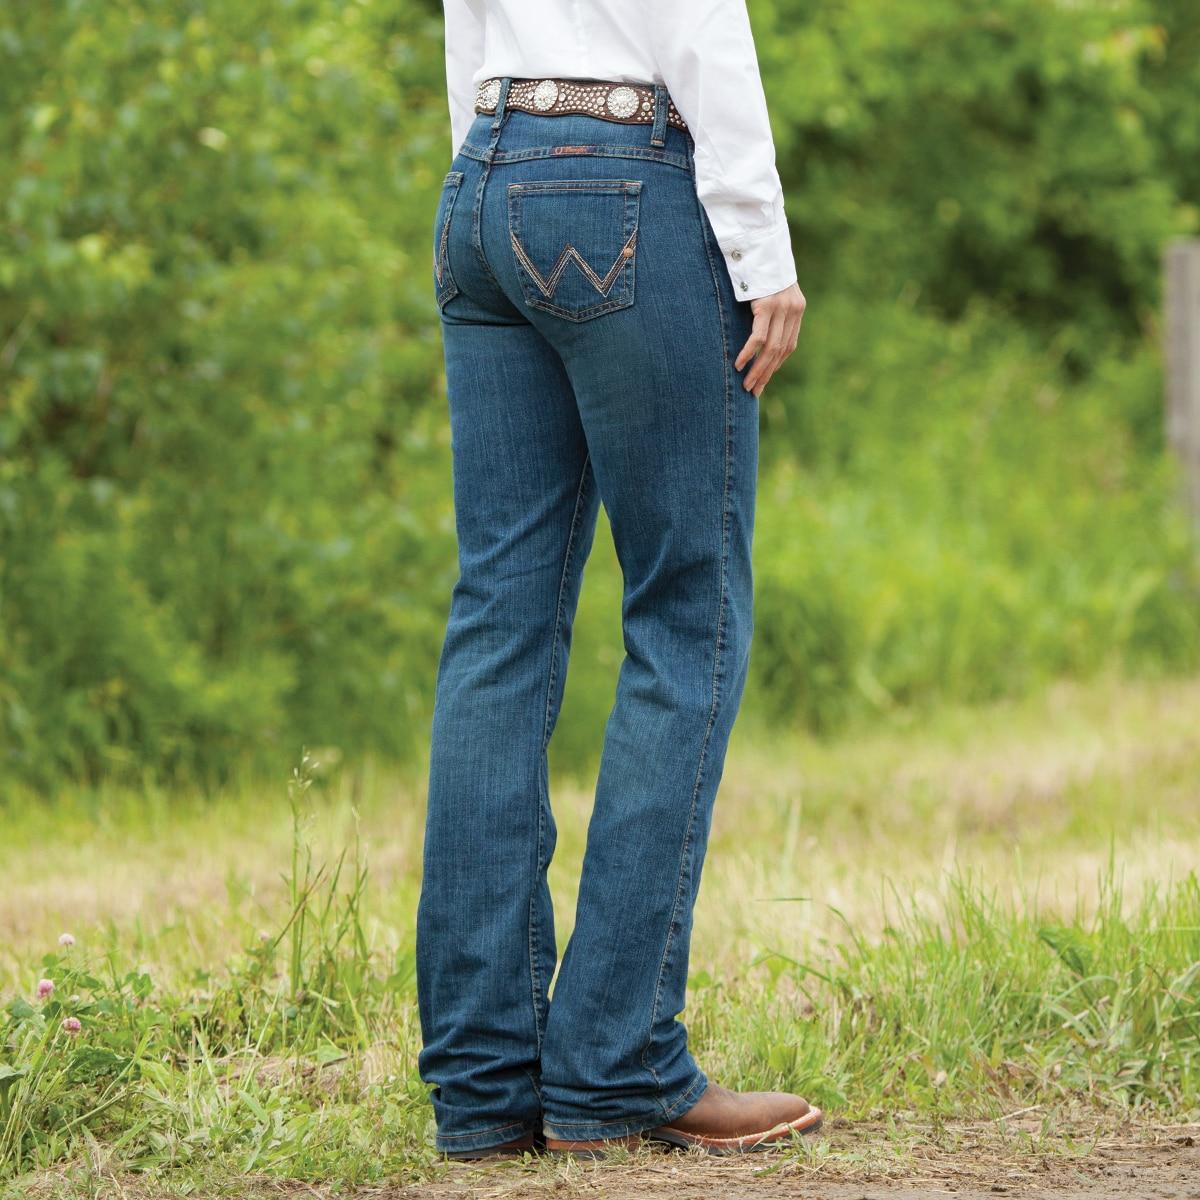 de375a14 Wrangler® Women's Ultimate Riding Jeans Q-Baby- Tuff Buck